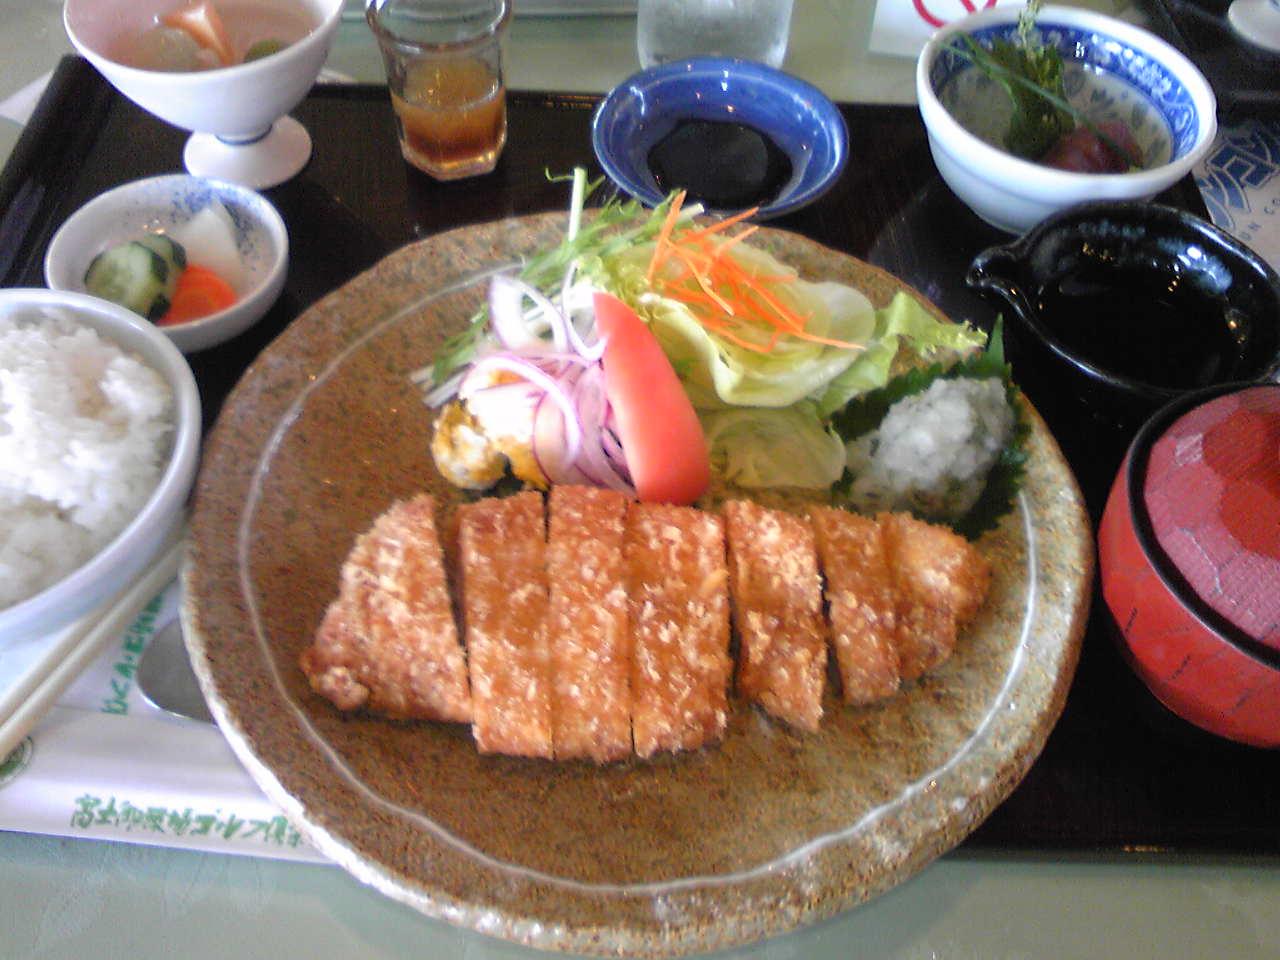 Image036 9/23本日の昼食: 中年オヤジW杯行ってきました!